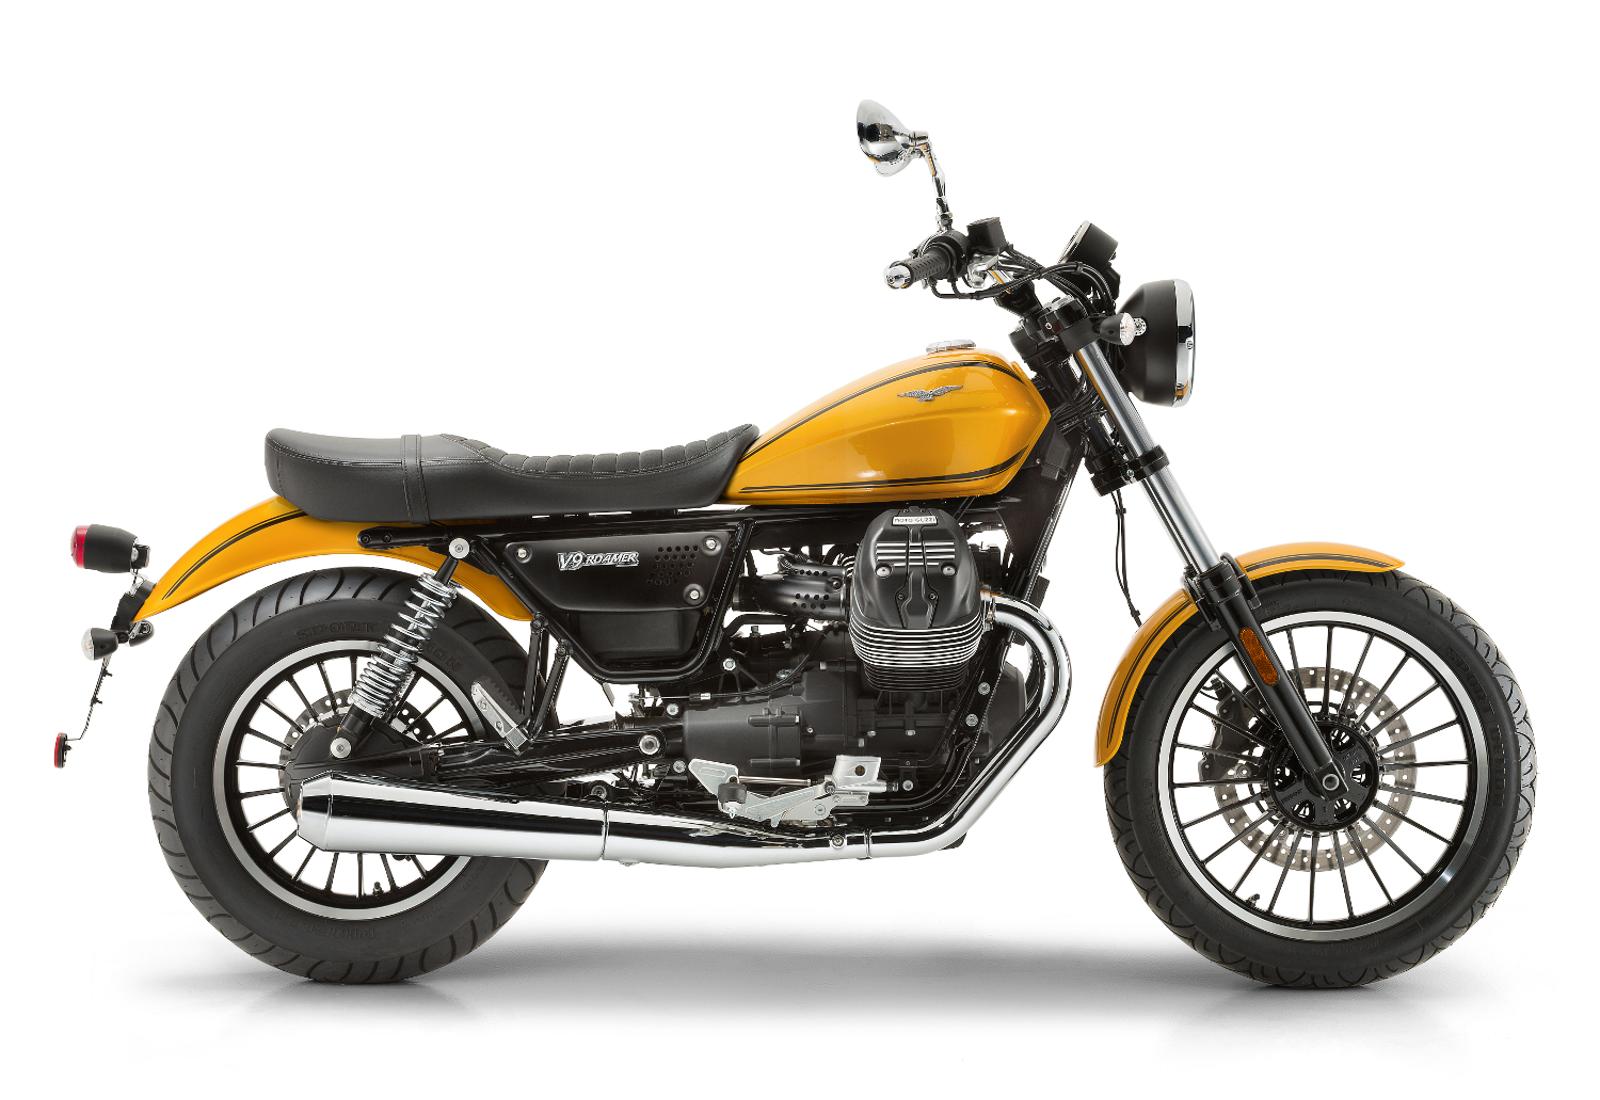 imagen de modelo V9 roamer de Moto Guzzi